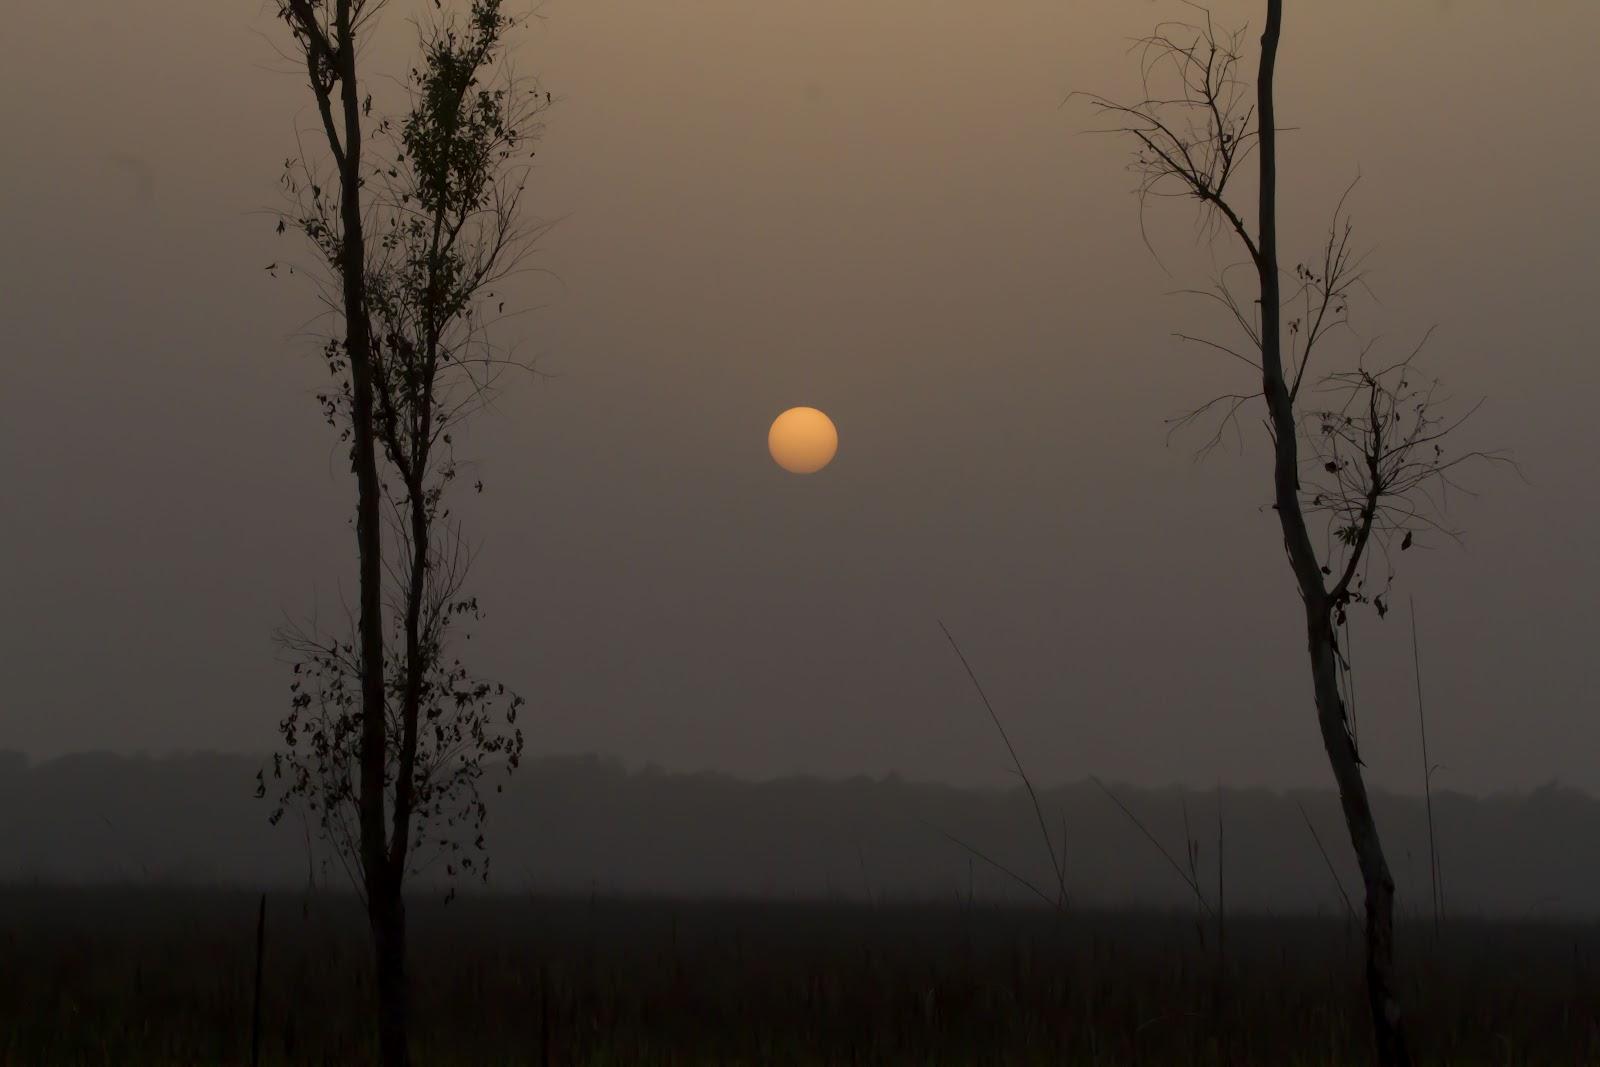 Dudhwa+Landscape+2.JPG